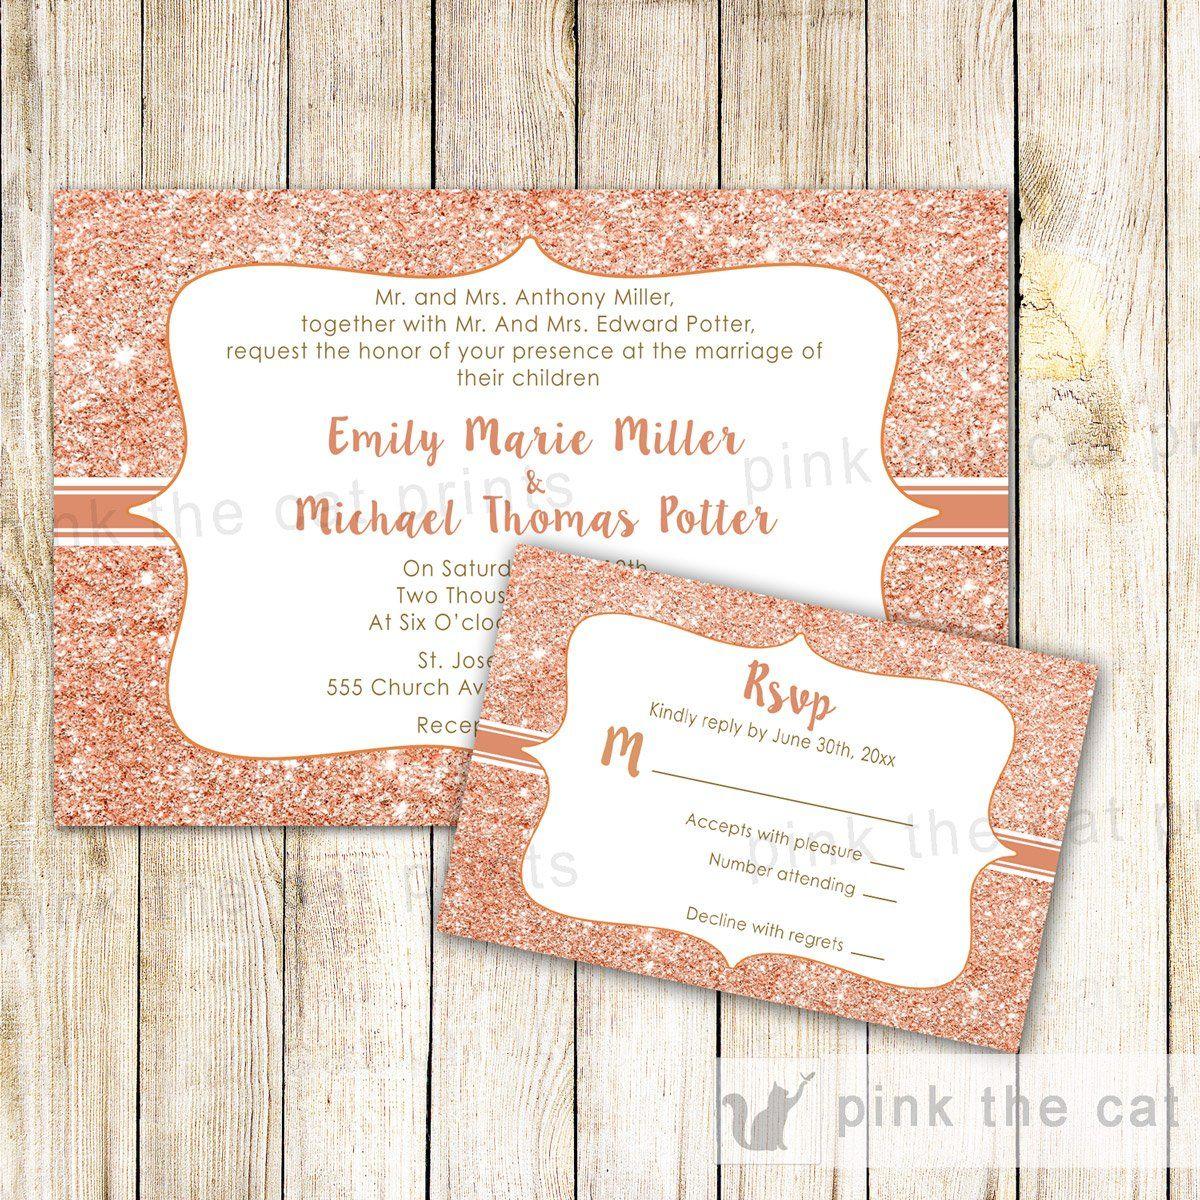 Rose Gold Glitter Wedding Invitations Rsvp Cards Pink The Cat Wedding Invitations Rsvp Cards Wedding Invitations Rsvp Wedding Invitations